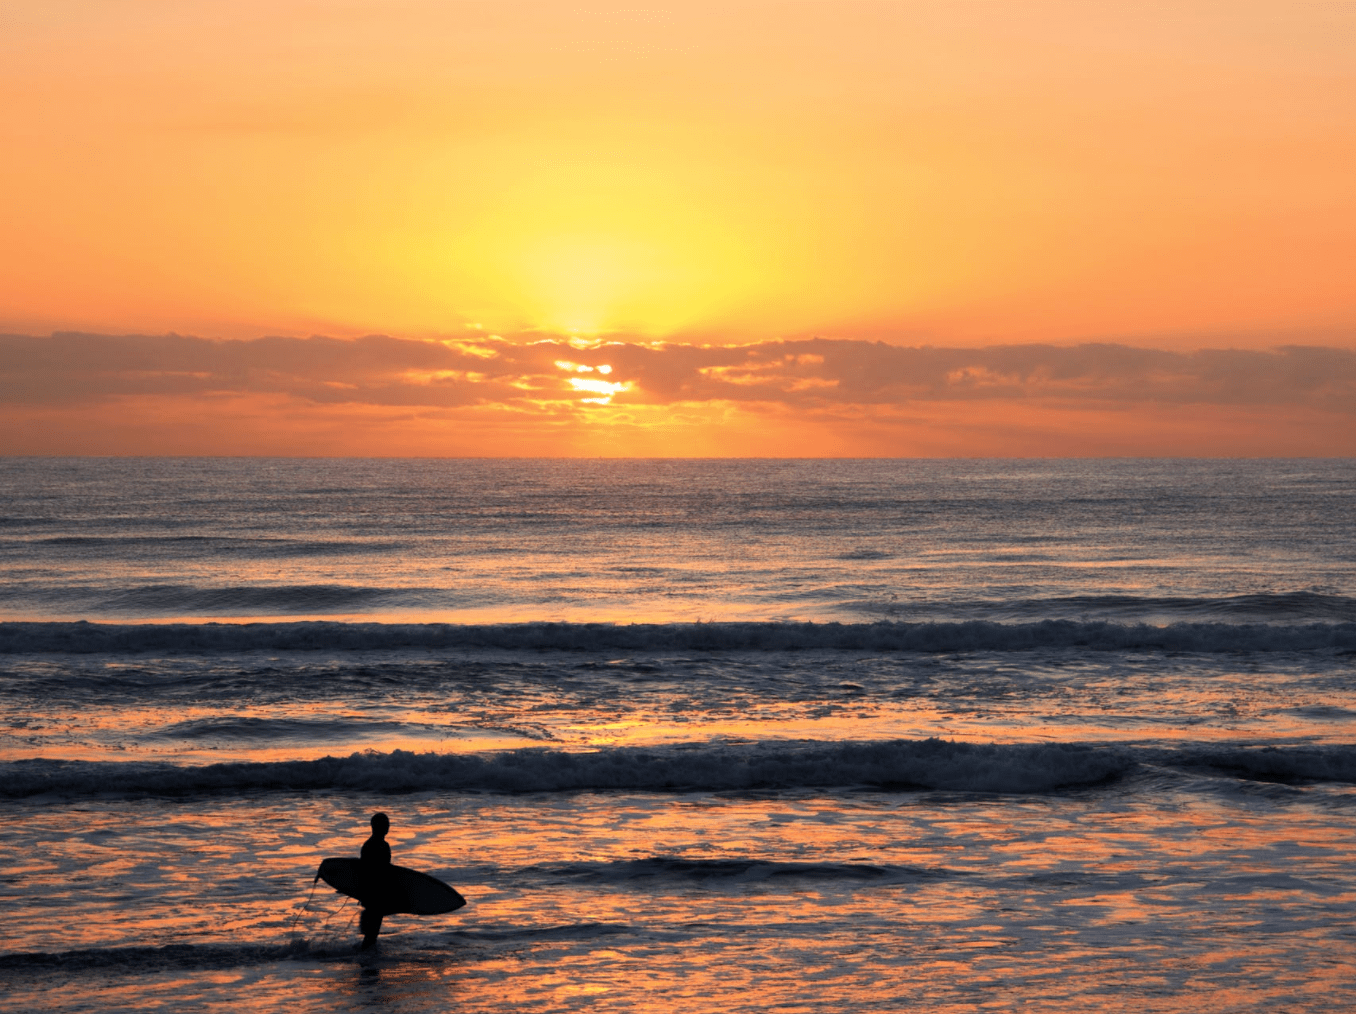 Surfing near me UK